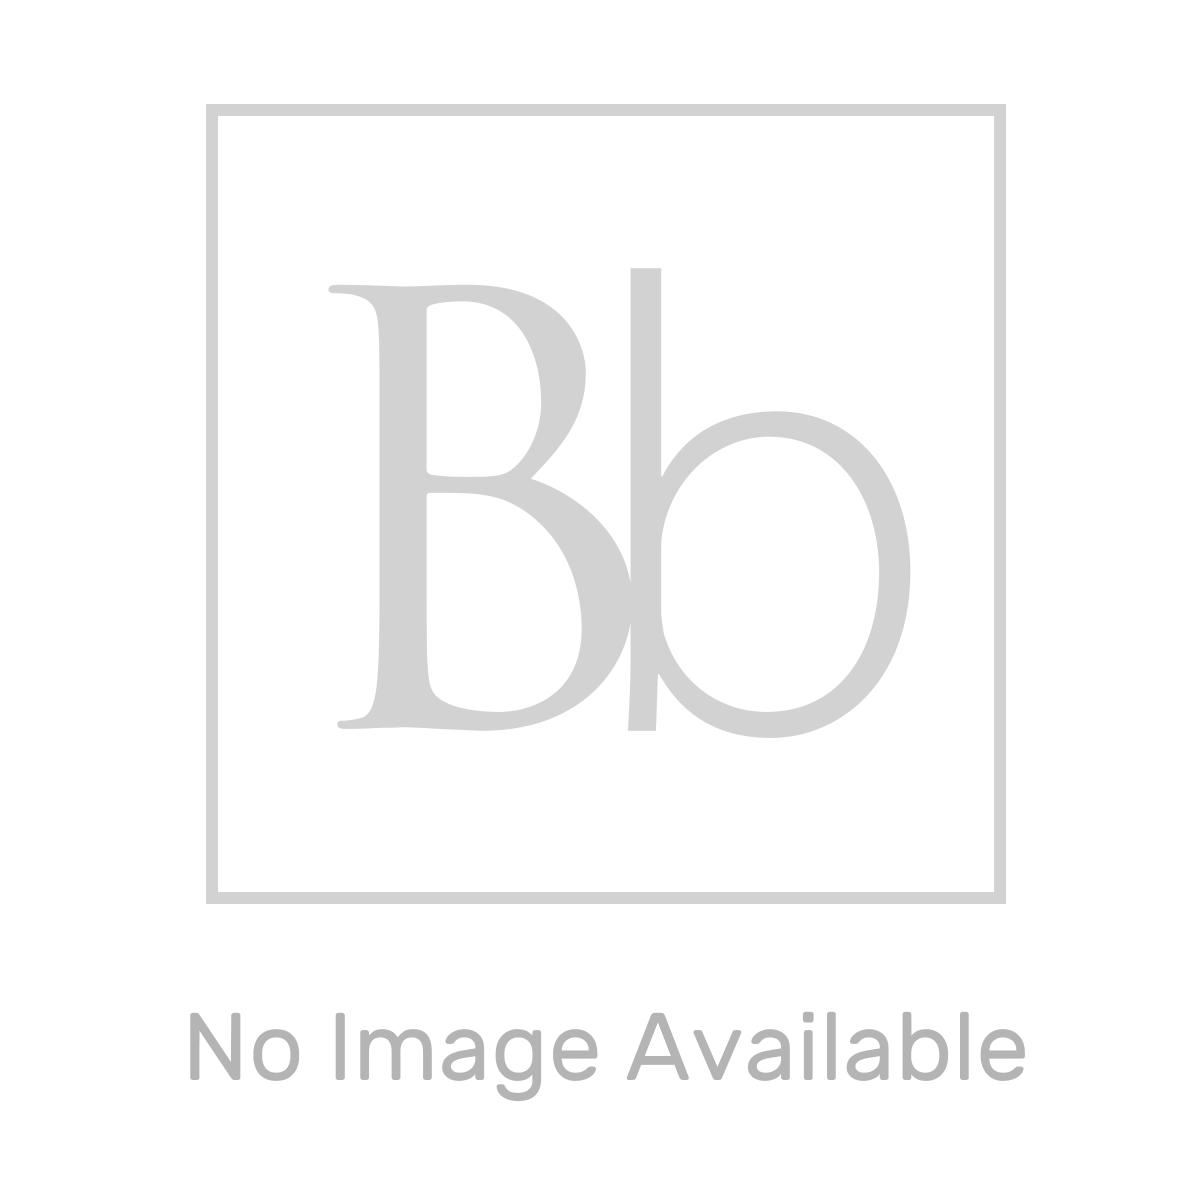 Ultra Large Round LED Fixed Shower Head